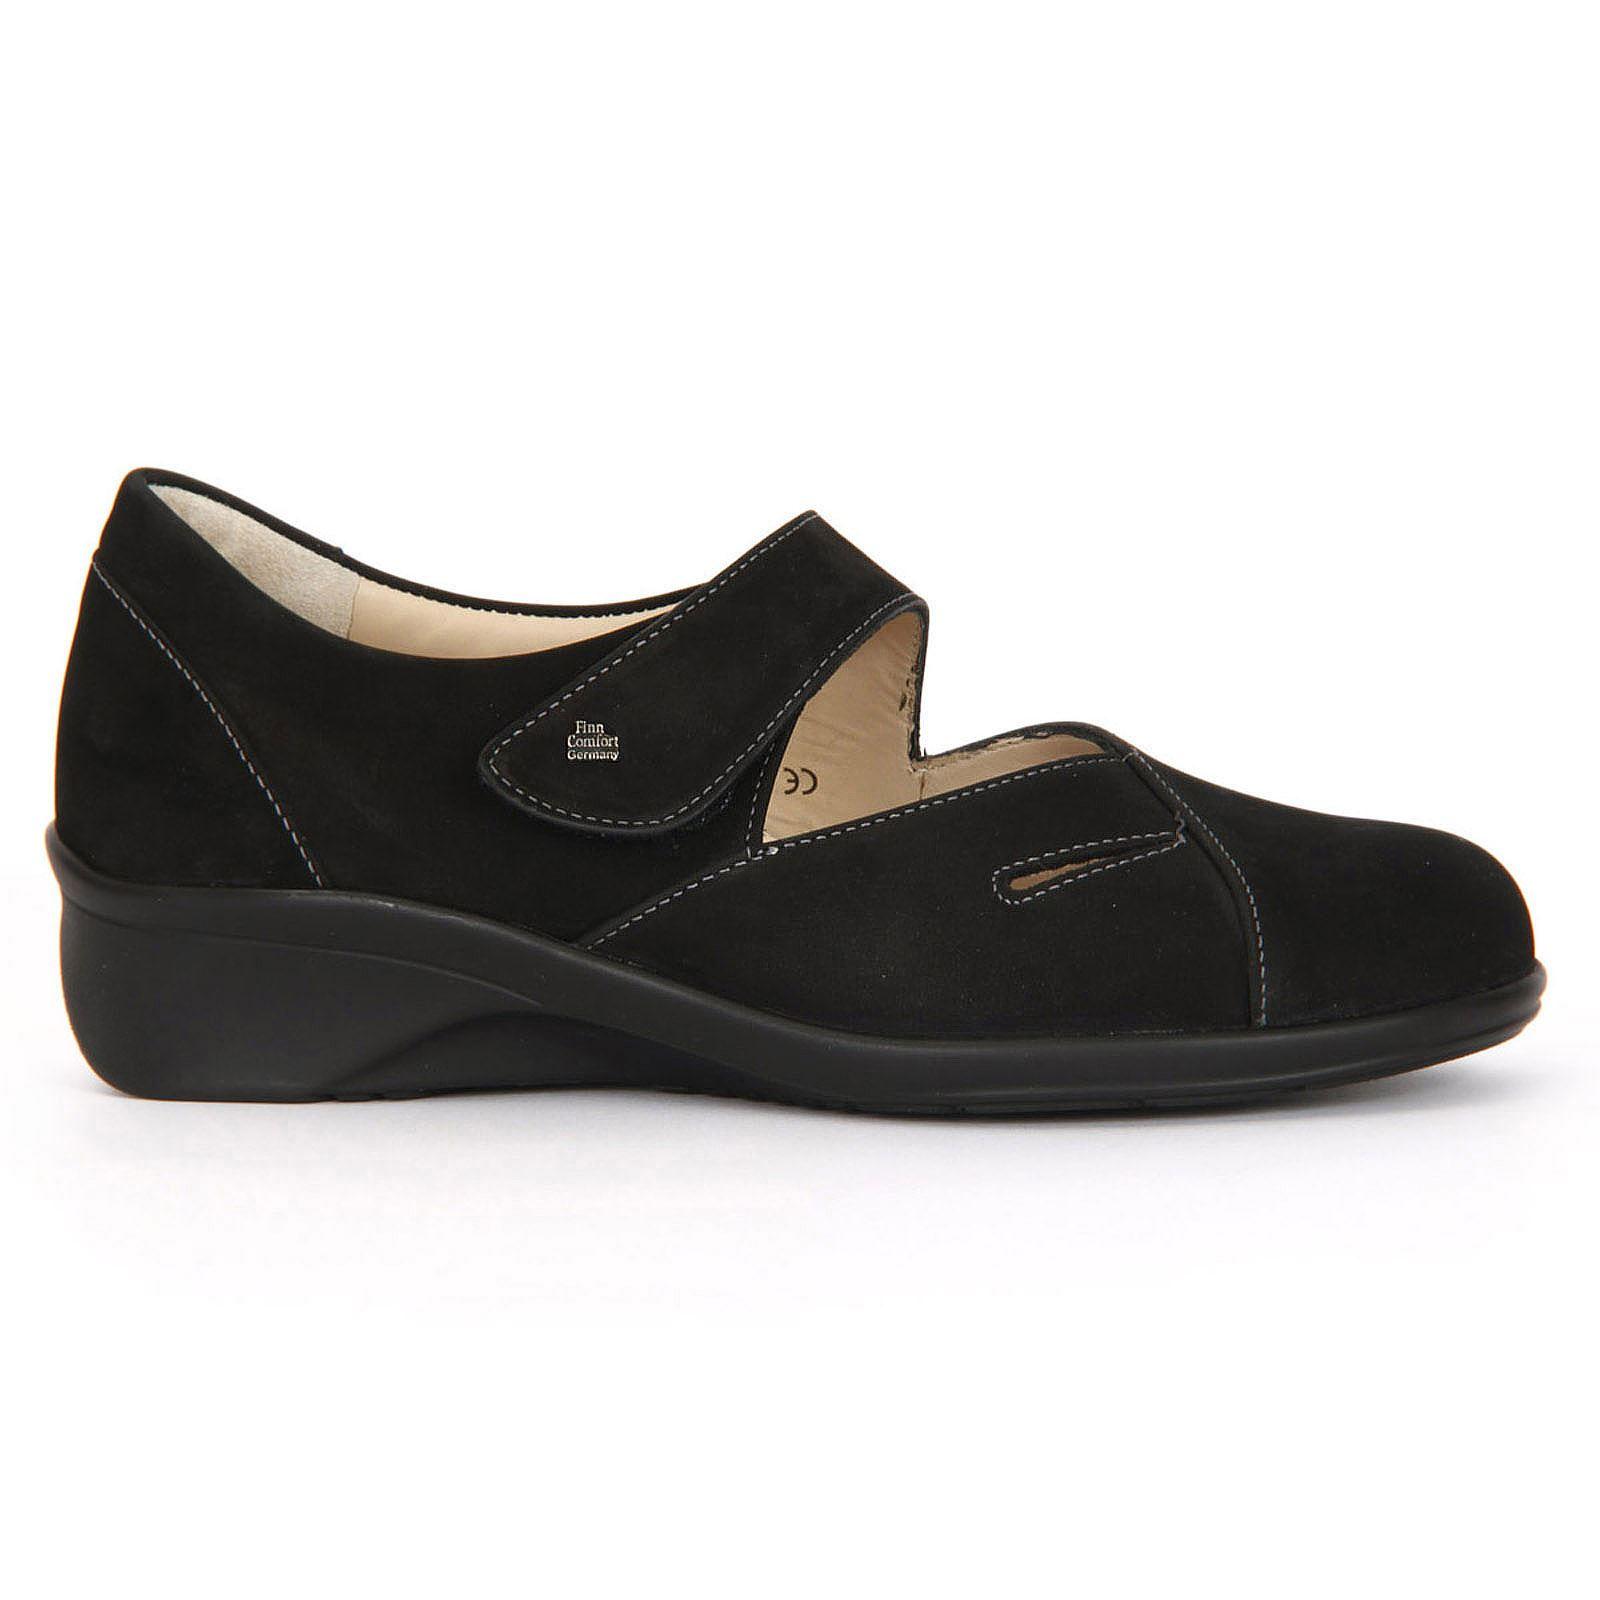 Finn Comfort Aquila 3594 Black Women Mary Jane Shoe Size 2.5-8.5 UK Nubuck